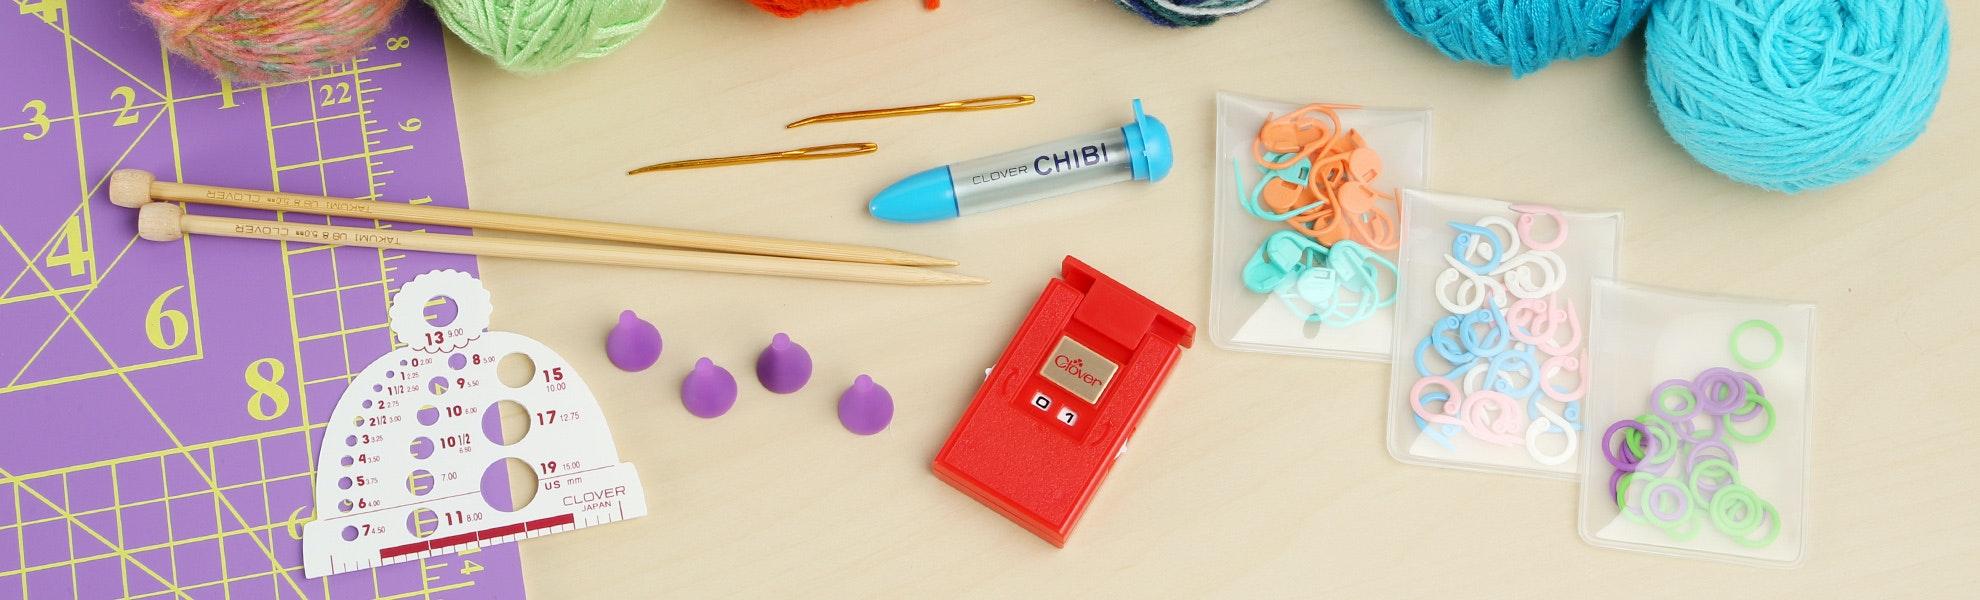 Beginners Knitting Notions Bundle